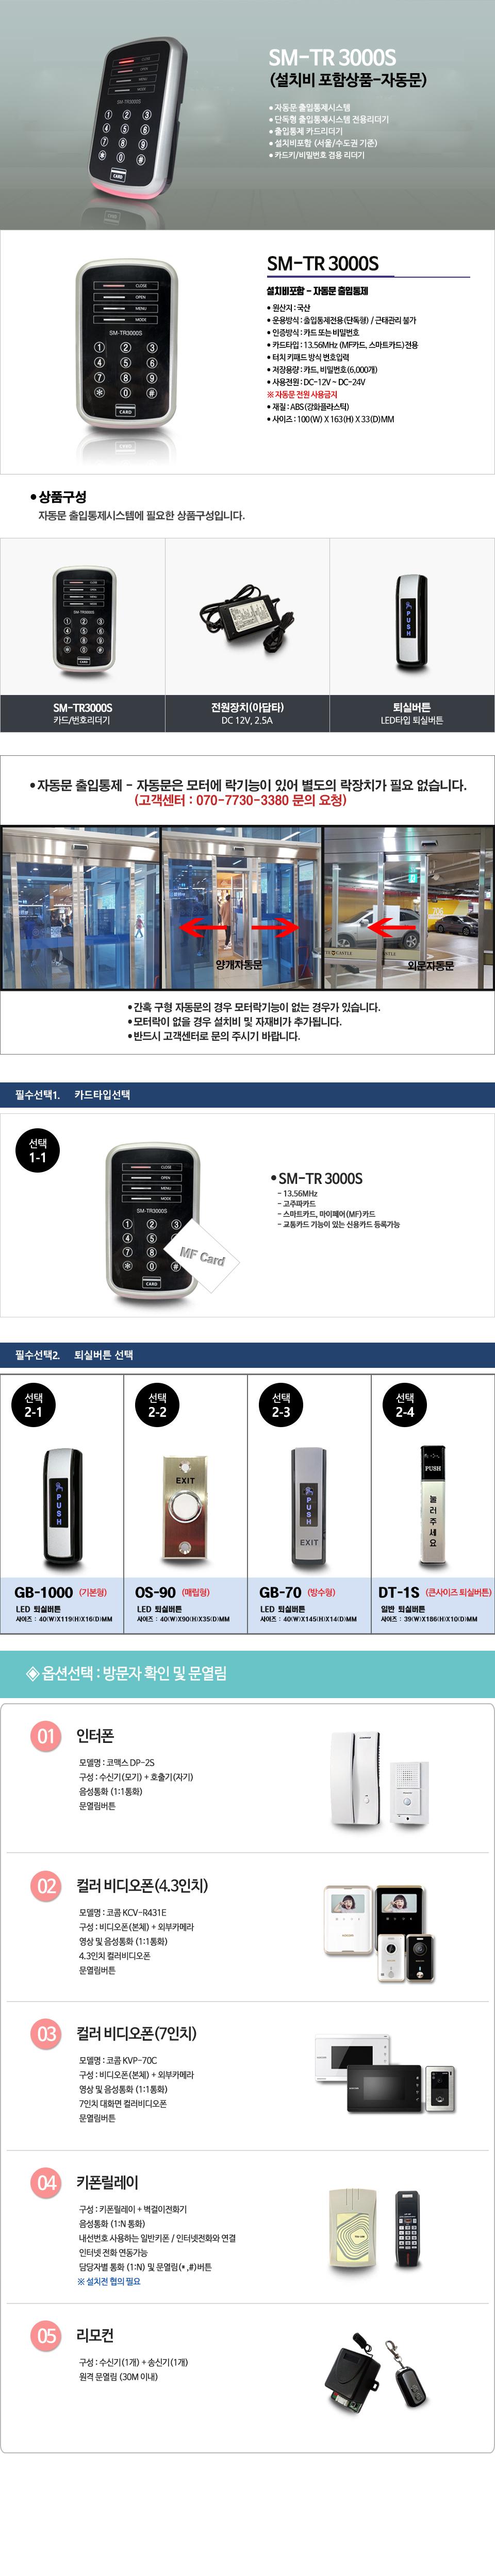 SM-TR3000S설치비포함작업-자동문.jpg